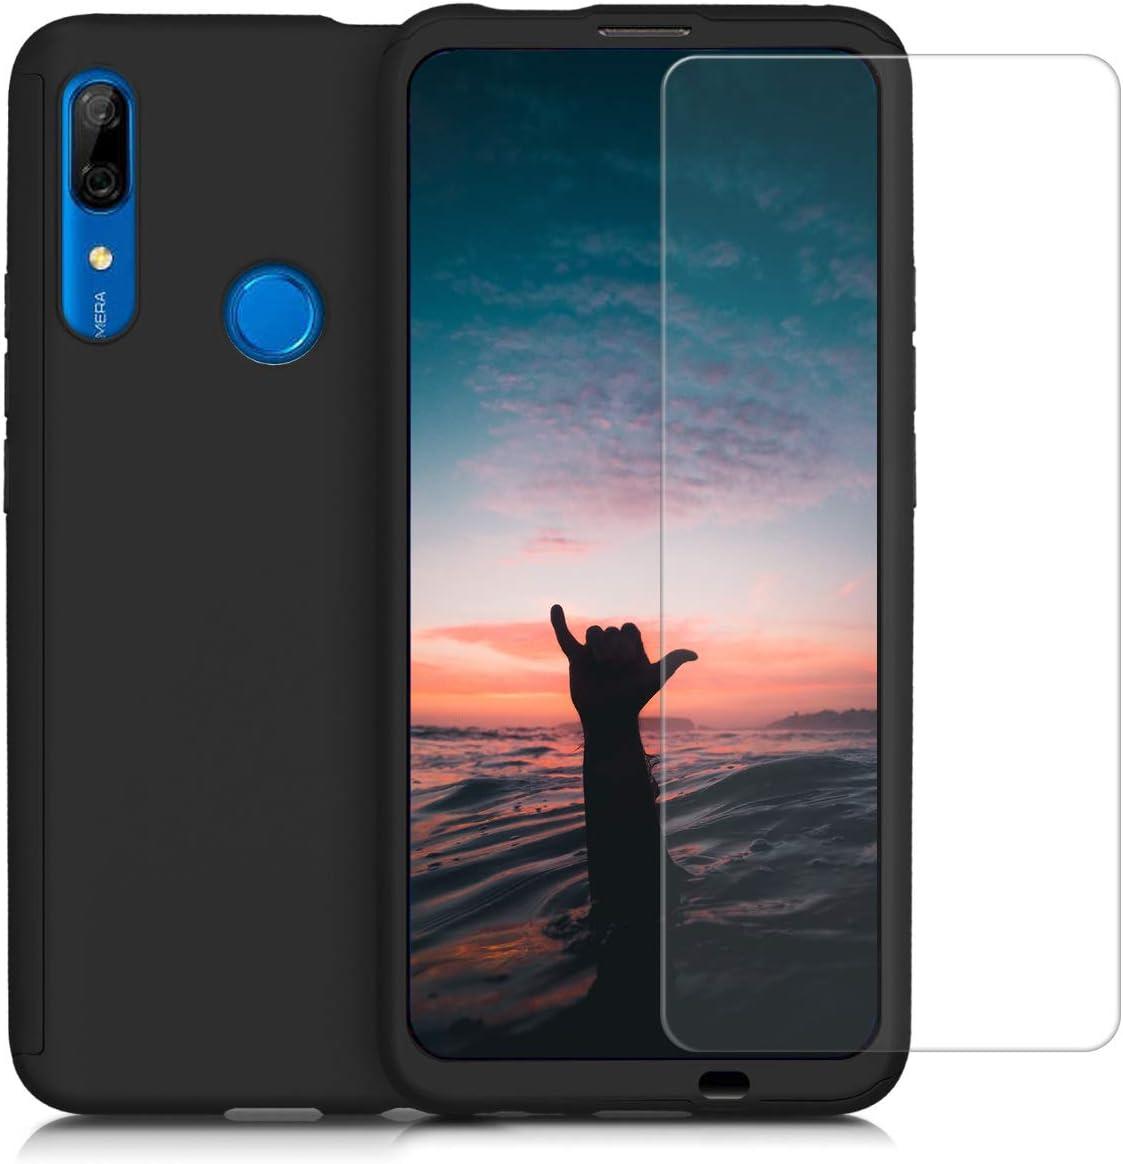 Carcasa Protectora con Cristal Templado kwmobile Funda Compatible con Huawei P Smart Z Cover con Protector Duro